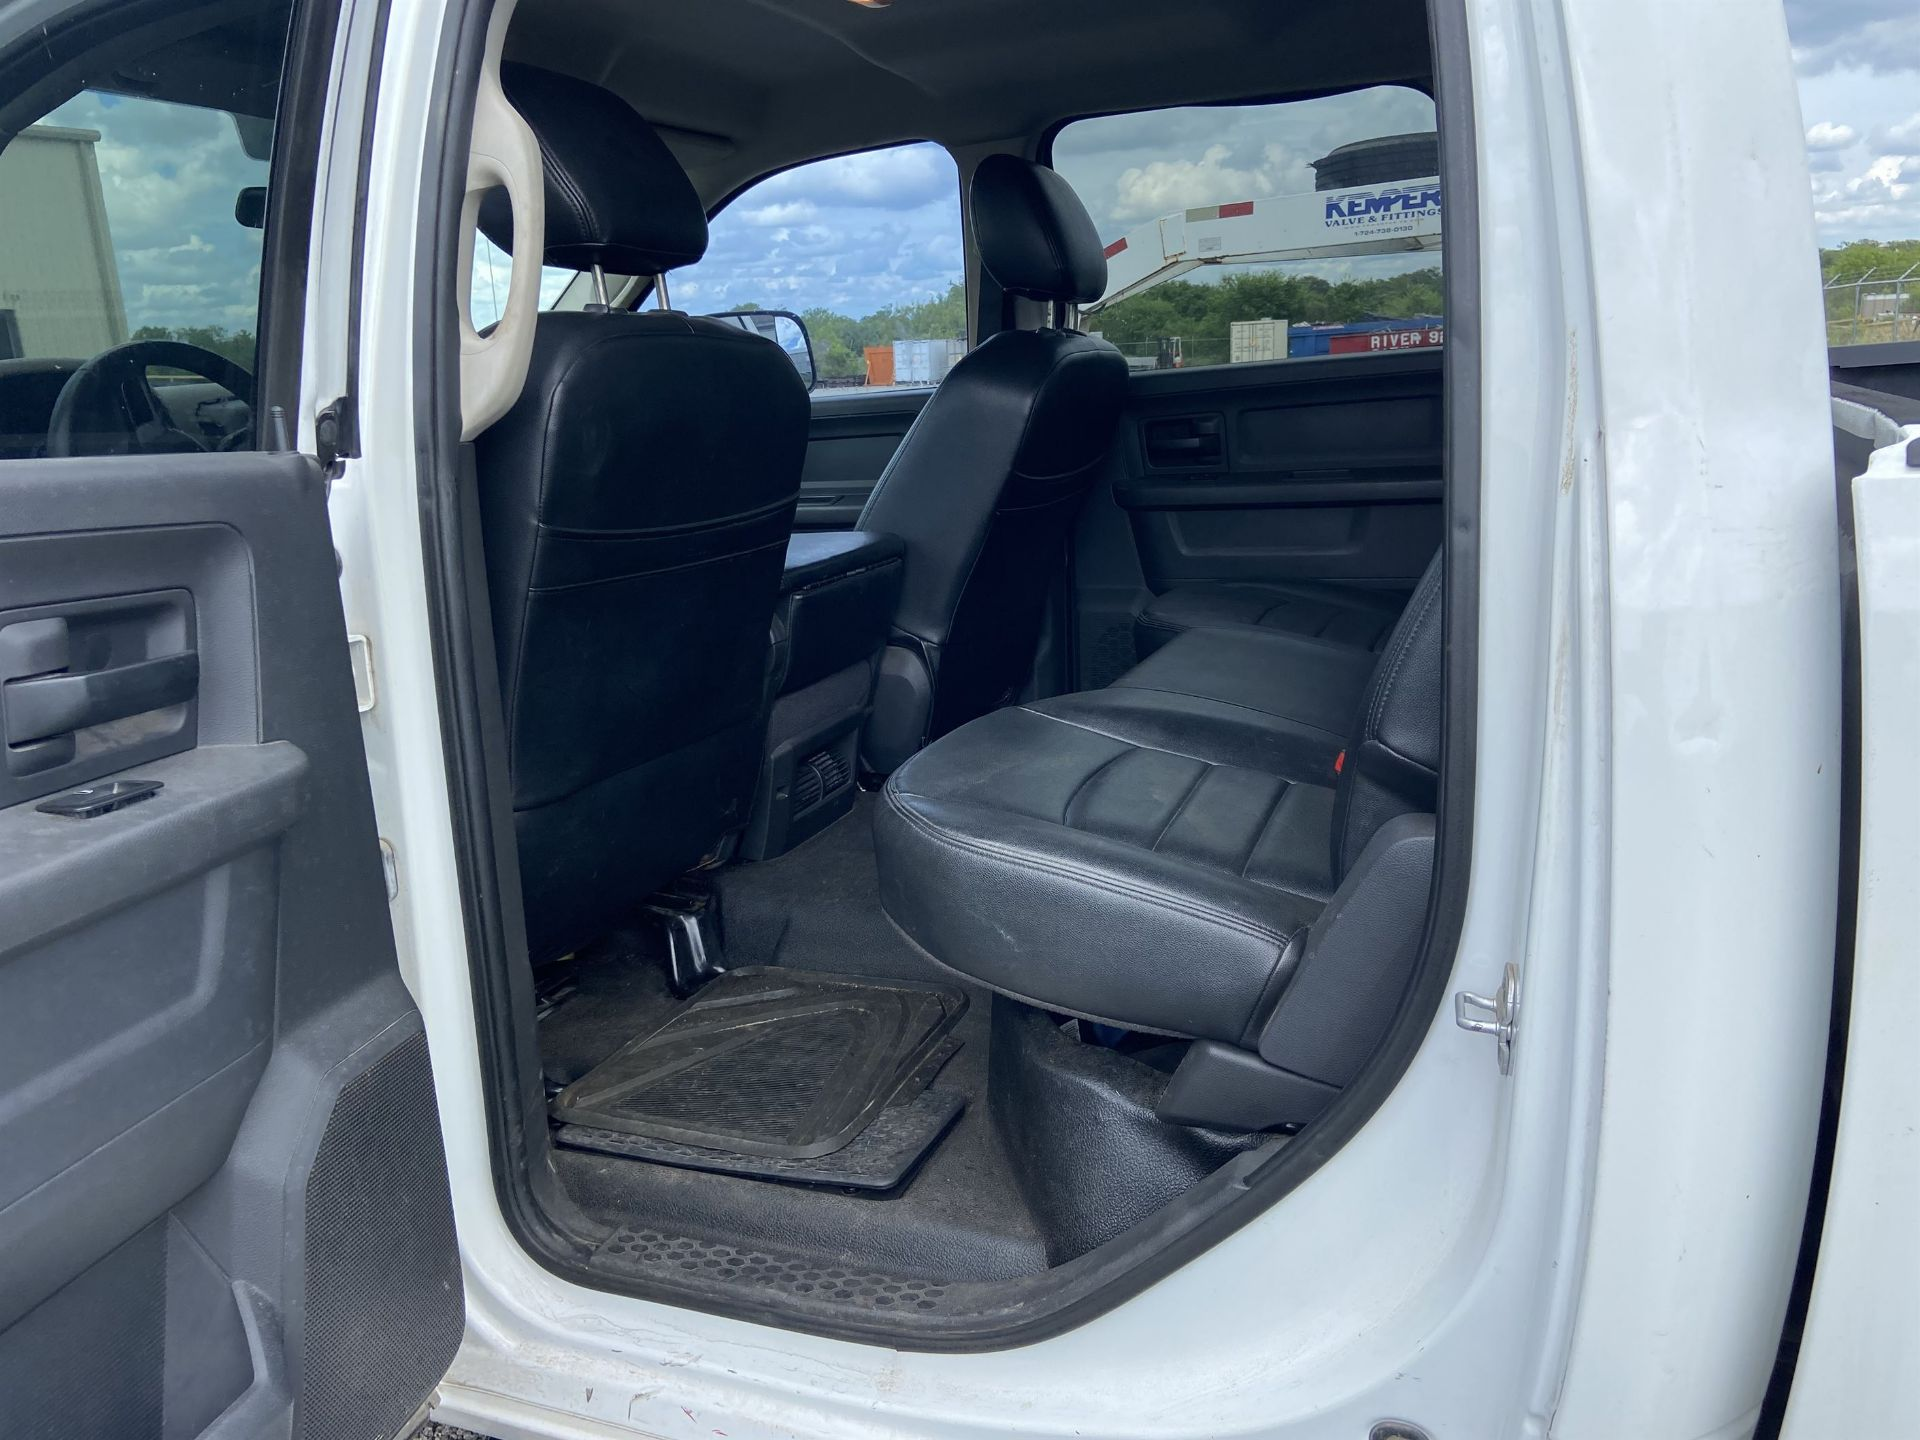 2011 Dodge Ram 2500 HD Crew Cab Long Bed, 212k Miles, Vinyl, 4x4, Gas, VIN # 3D7TT2CT9BG626009 - Image 11 of 16